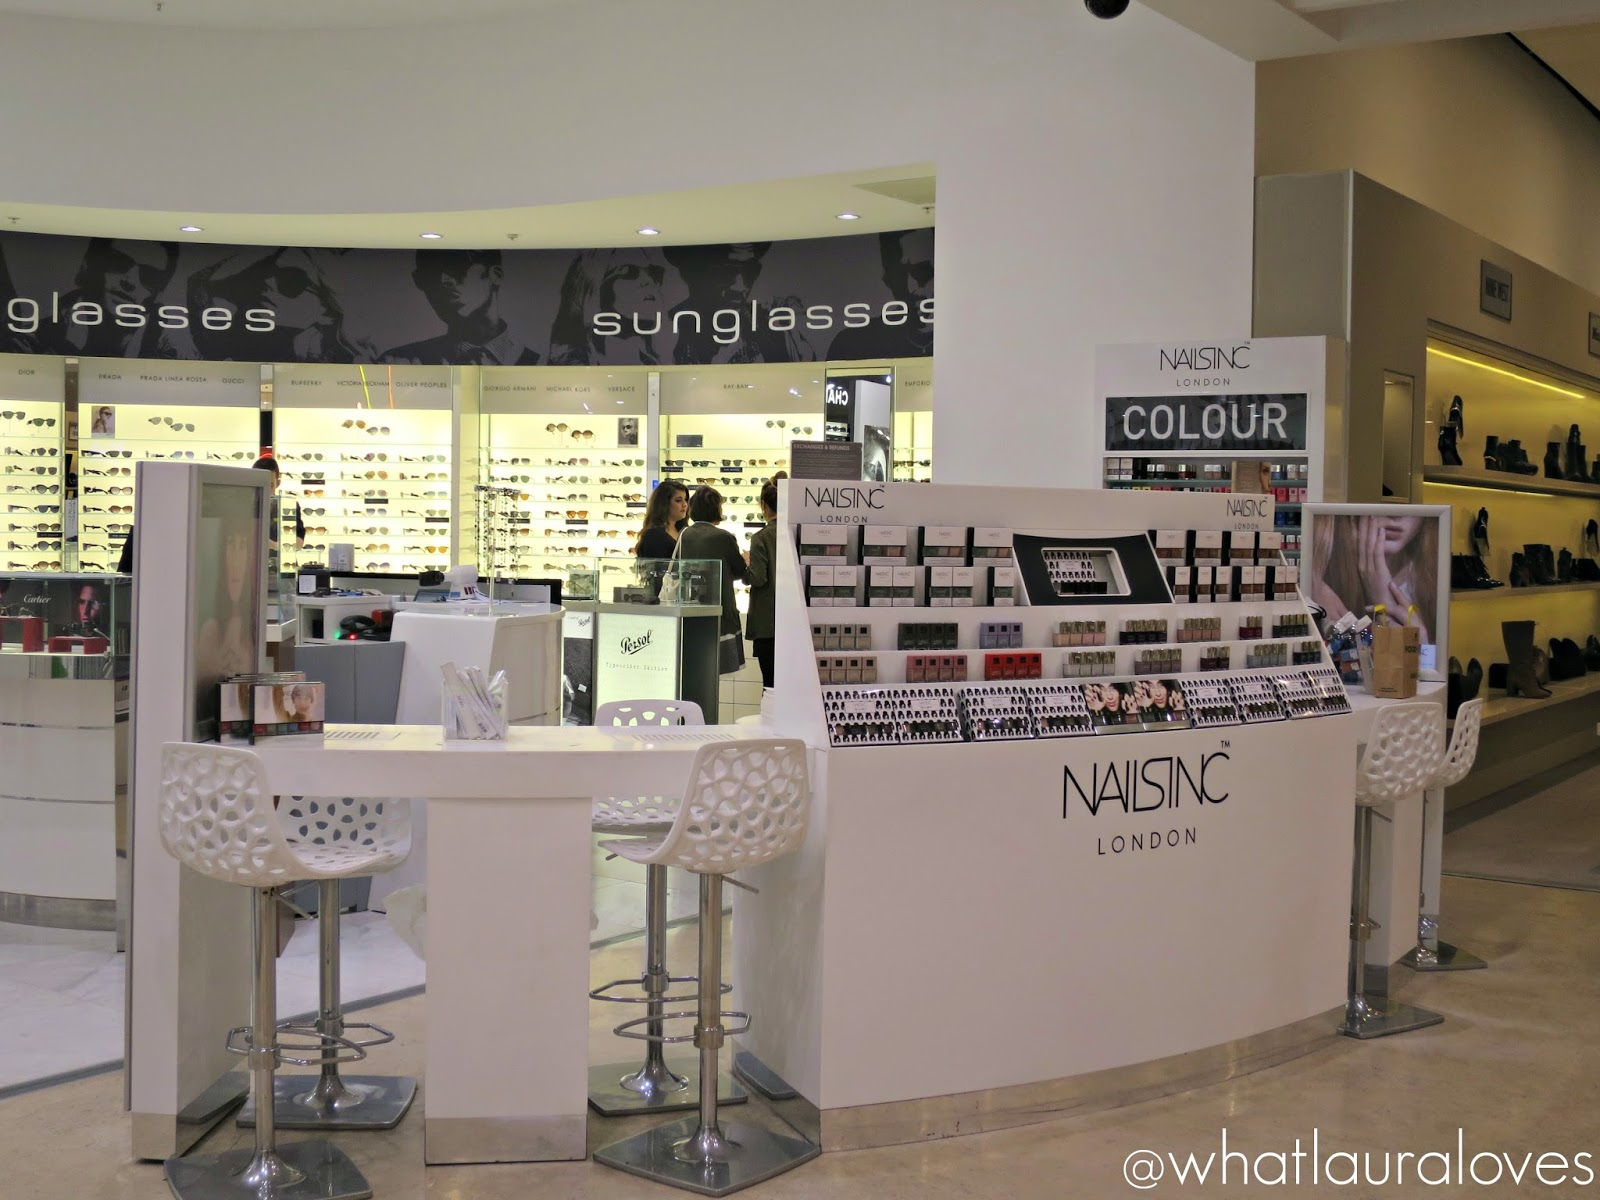 efb224d8c2b74 Nails Inc Express Manicure at Selfridges Trafford Centre - What ...